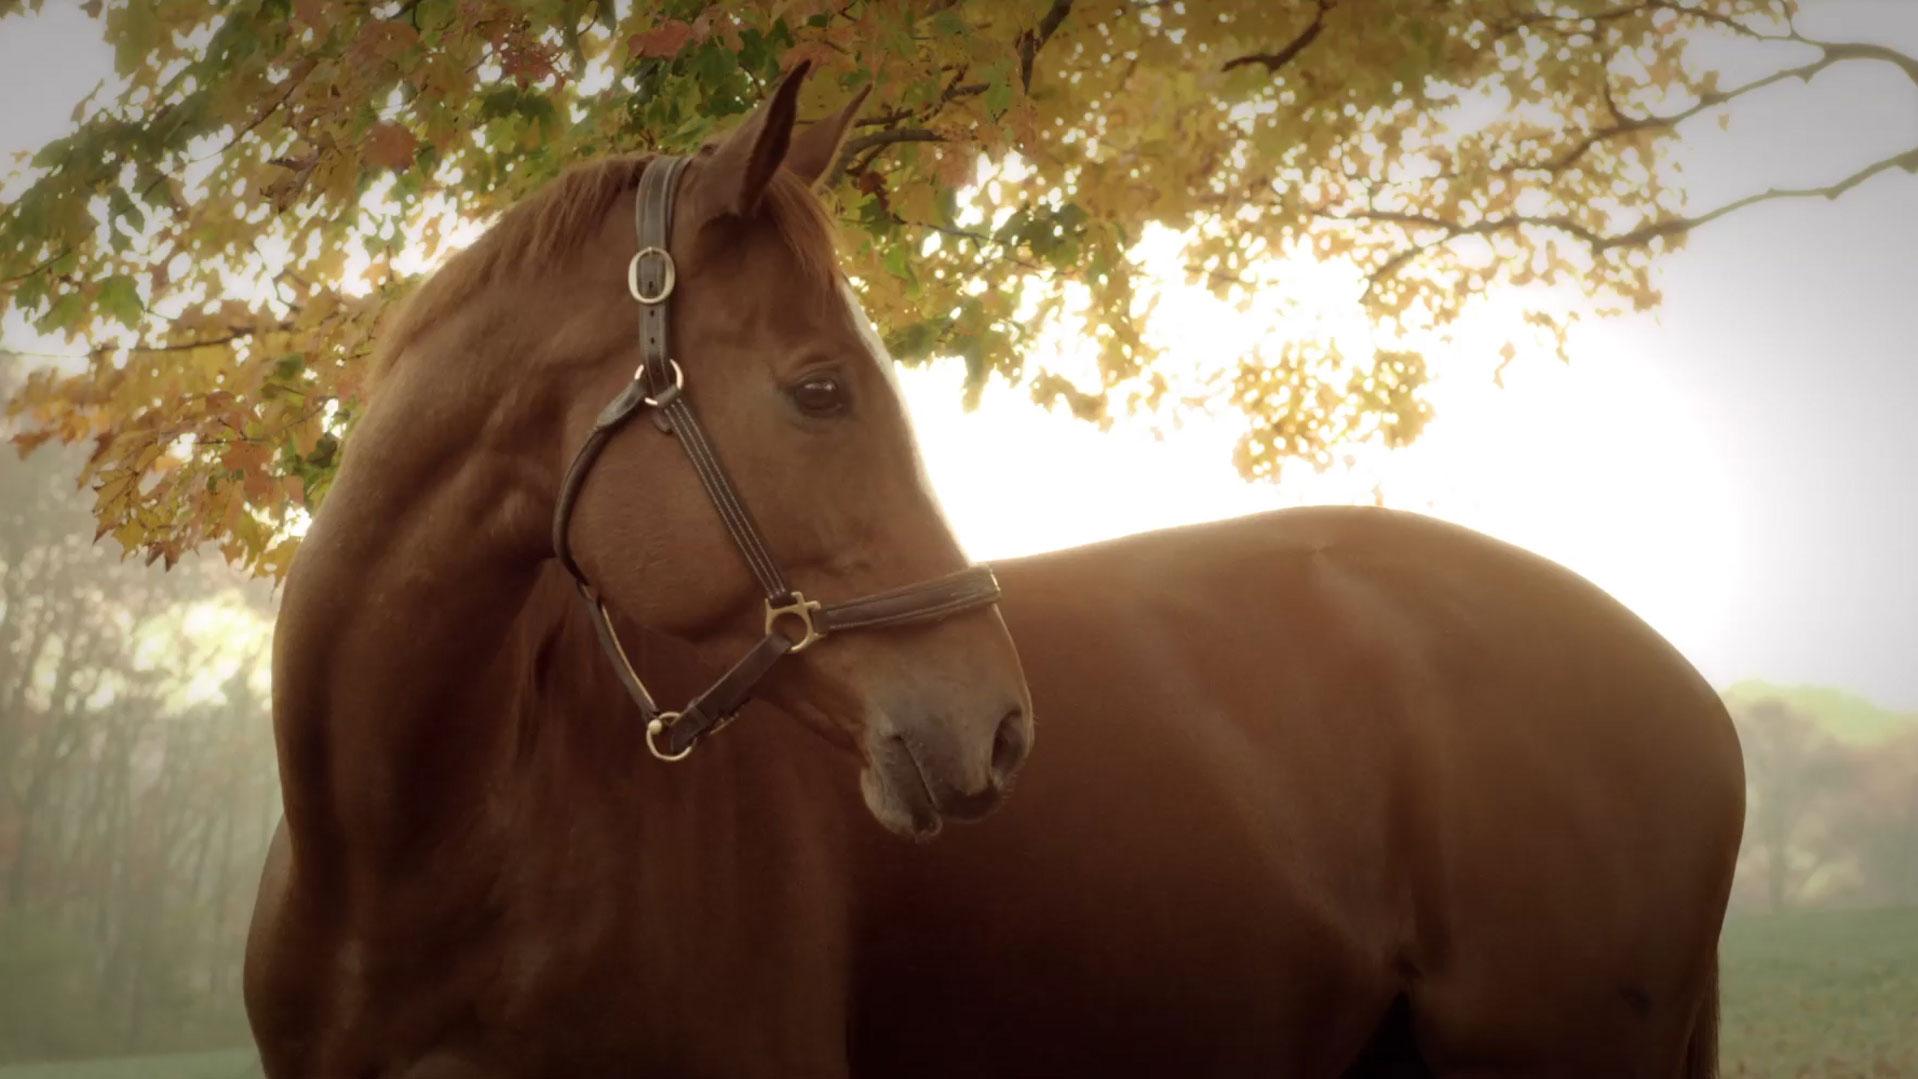 equestrian-bg